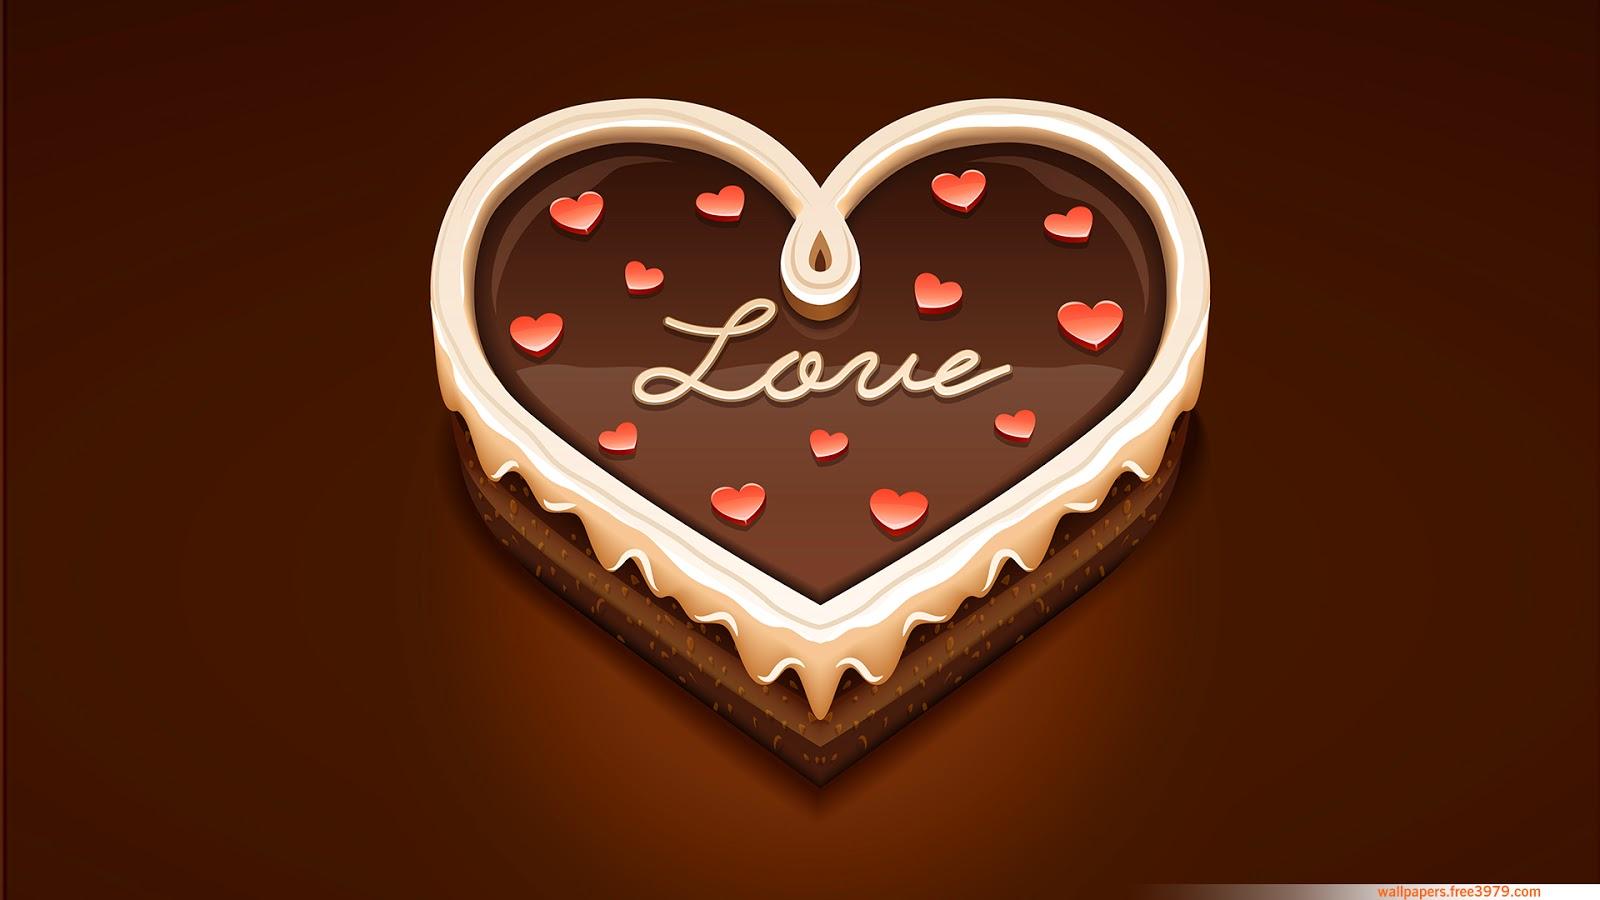 wallpapers-wallpaper: love heart sweet chocolate